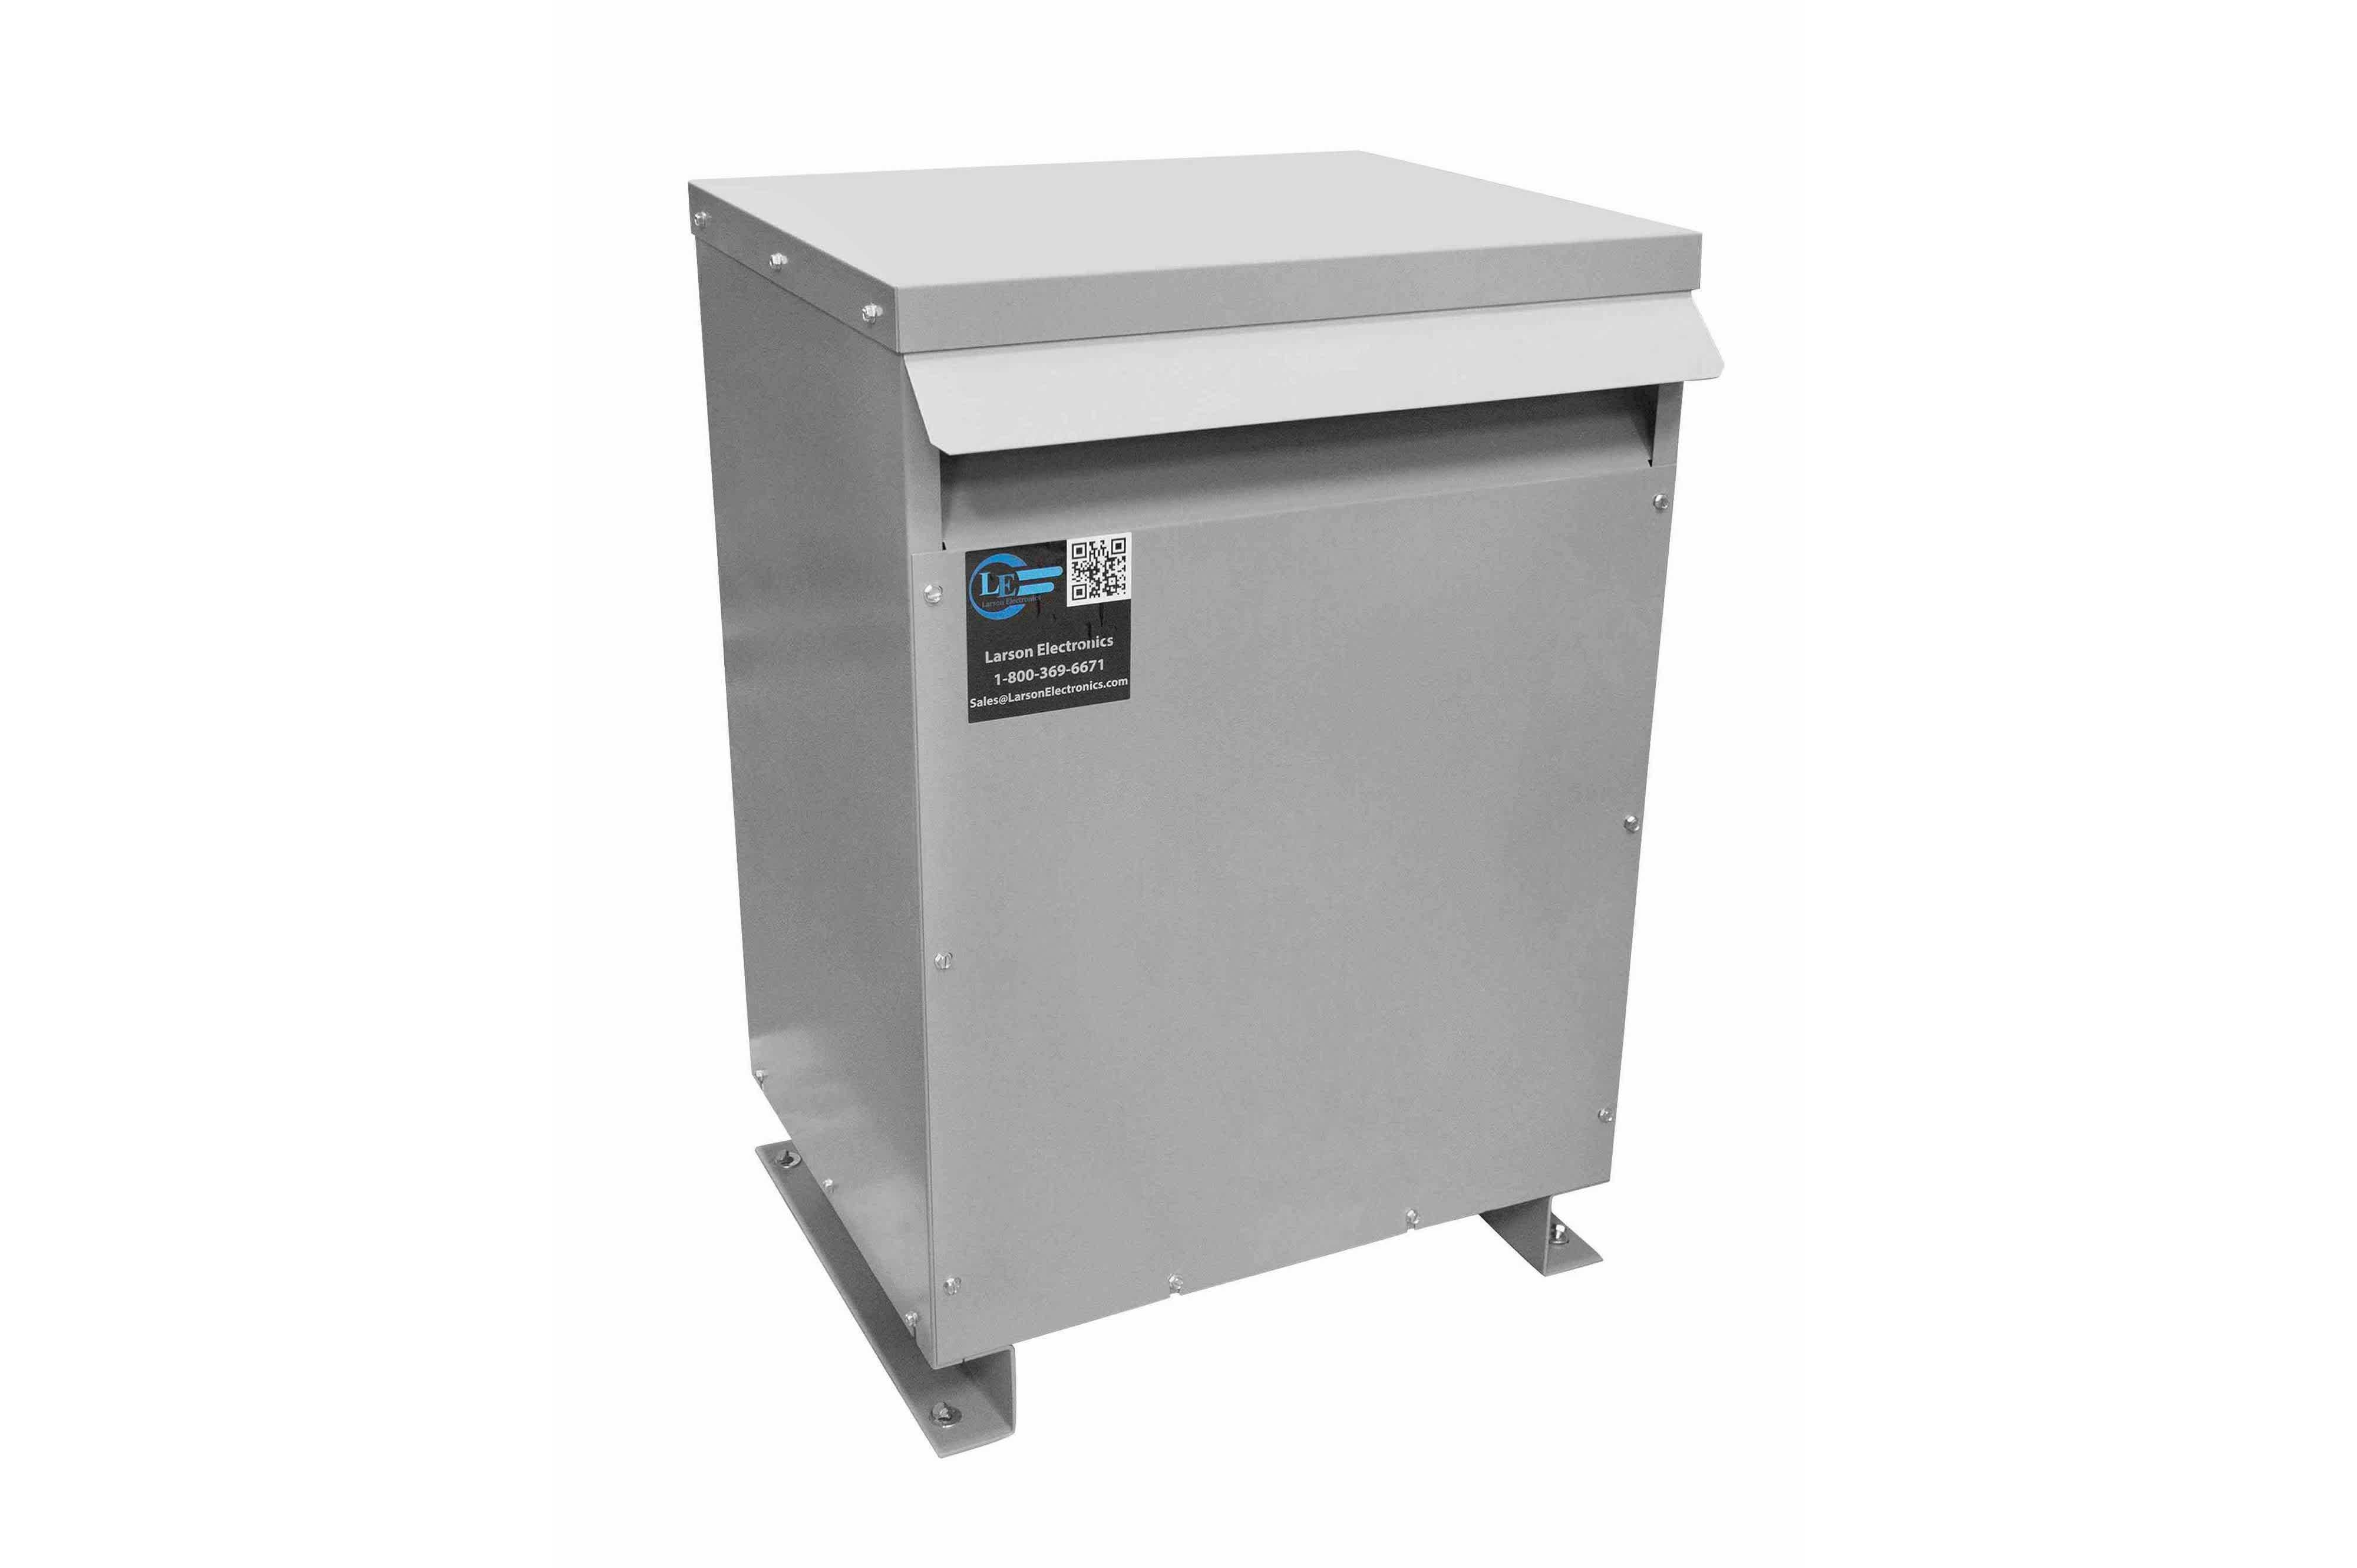 60 kVA 3PH Isolation Transformer, 460V Wye Primary, 240V Delta Secondary, N3R, Ventilated, 60 Hz